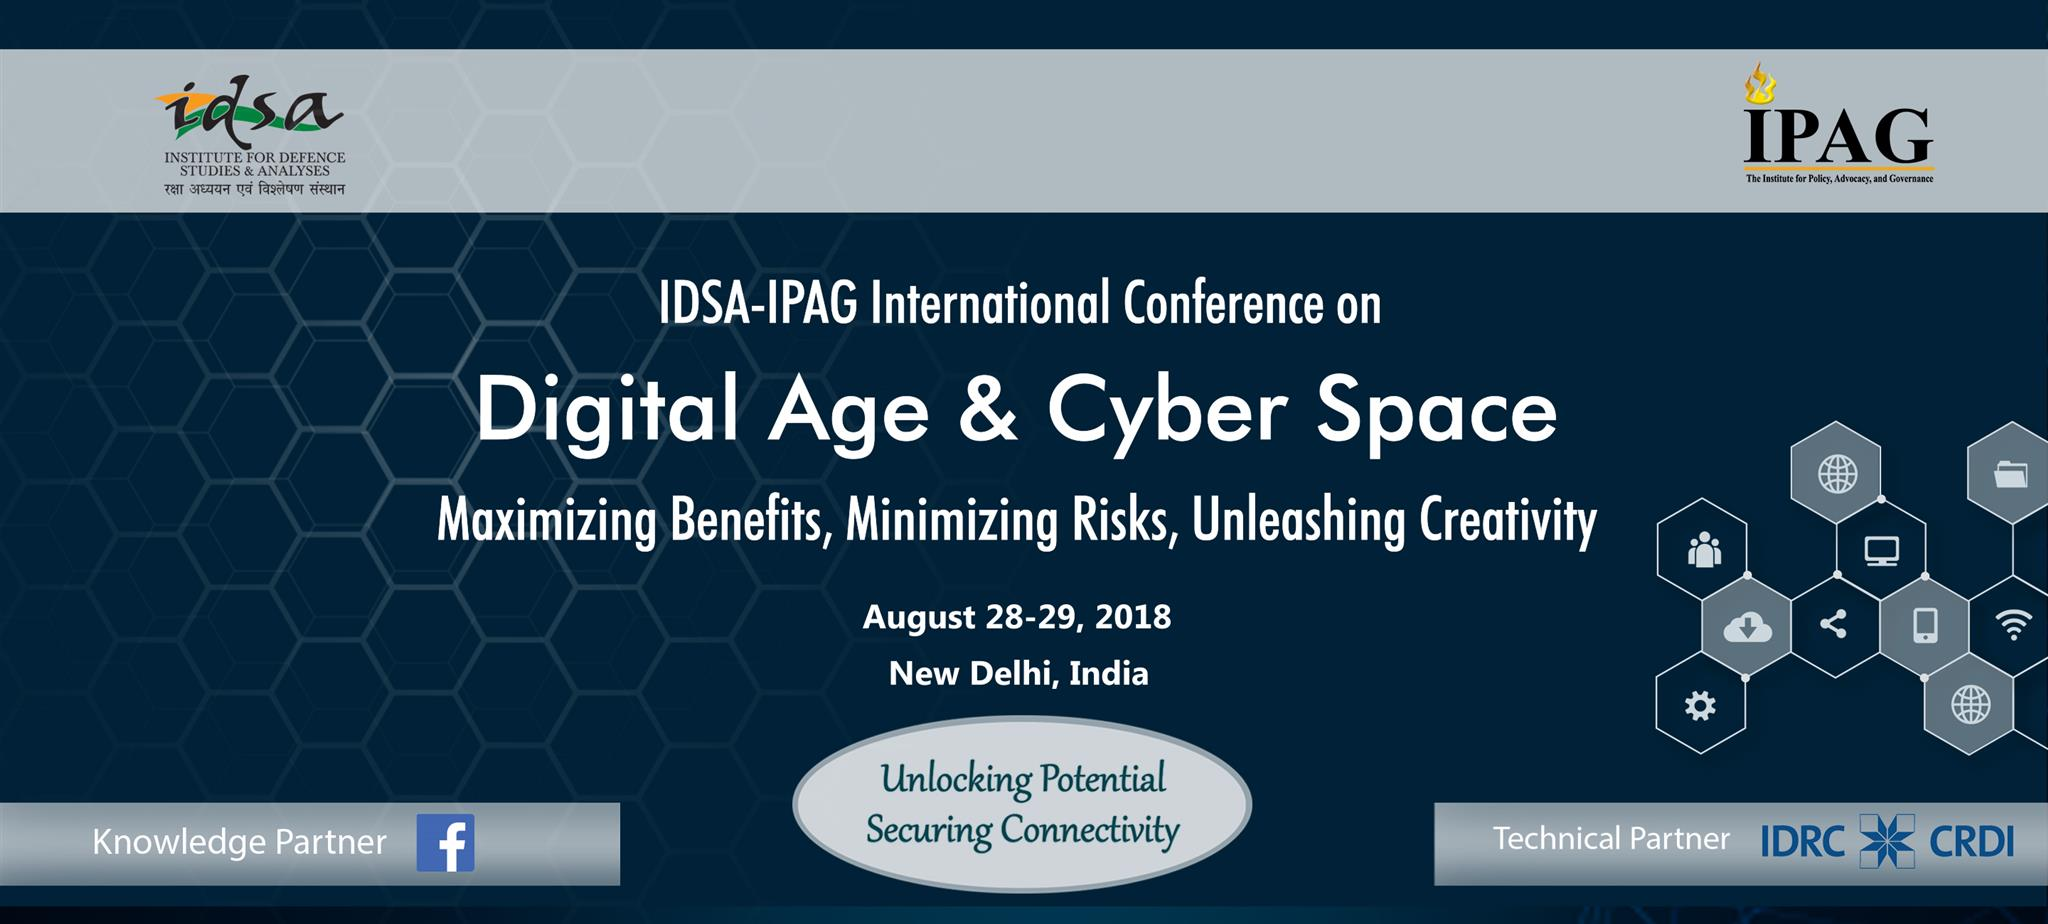 Digital Age & Cyber Space: Maximizing Benefits , Minimizing Risks, Unleashing Creativity